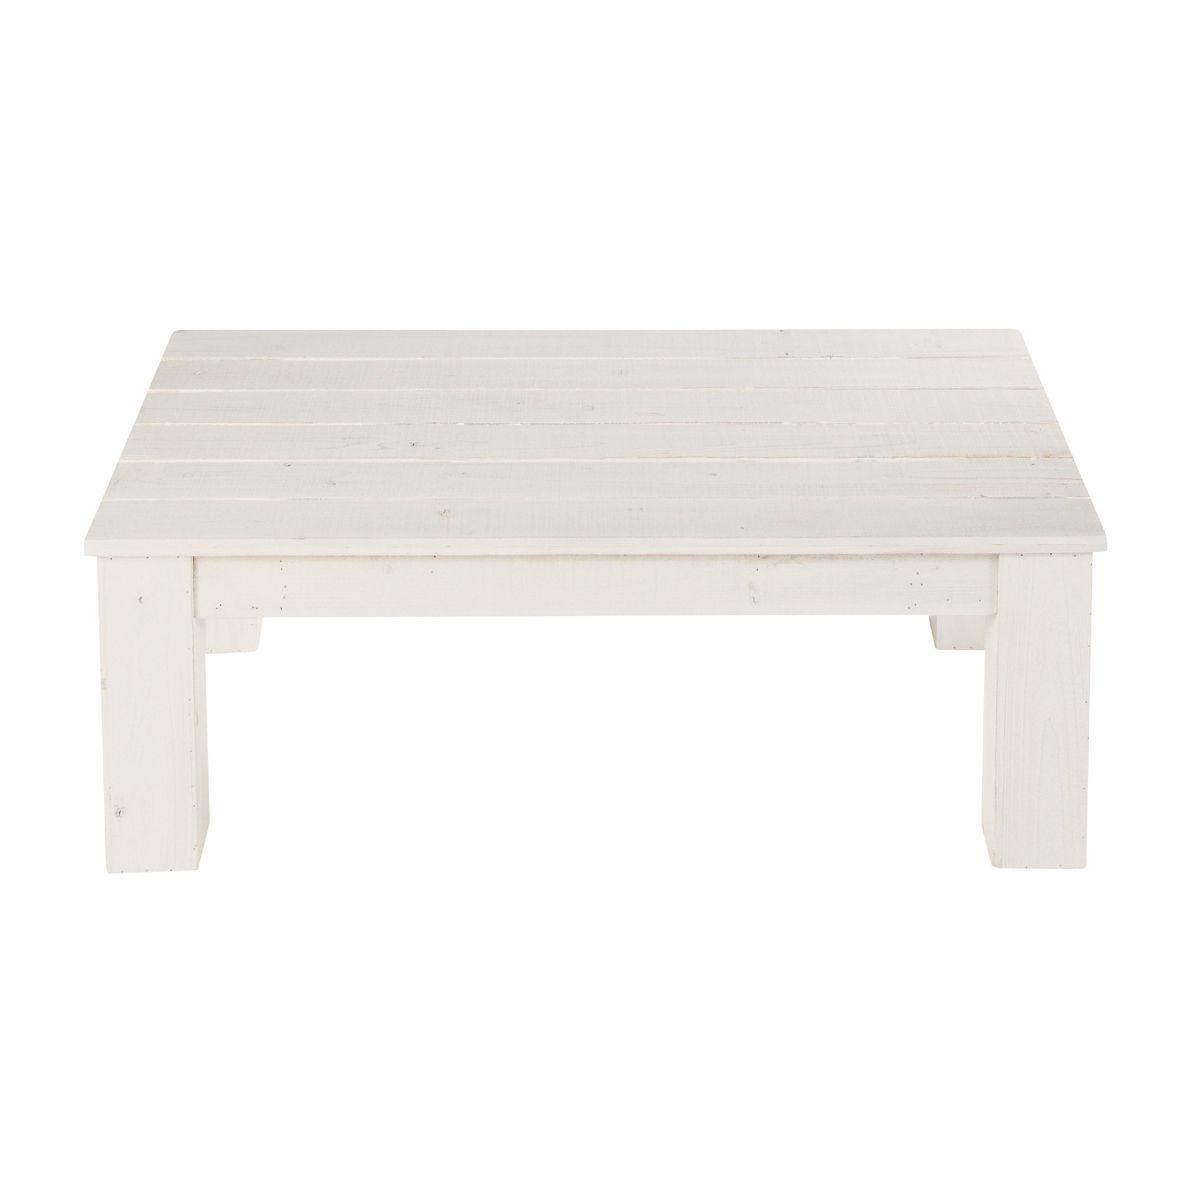 Table basse de jardin blanche FARO